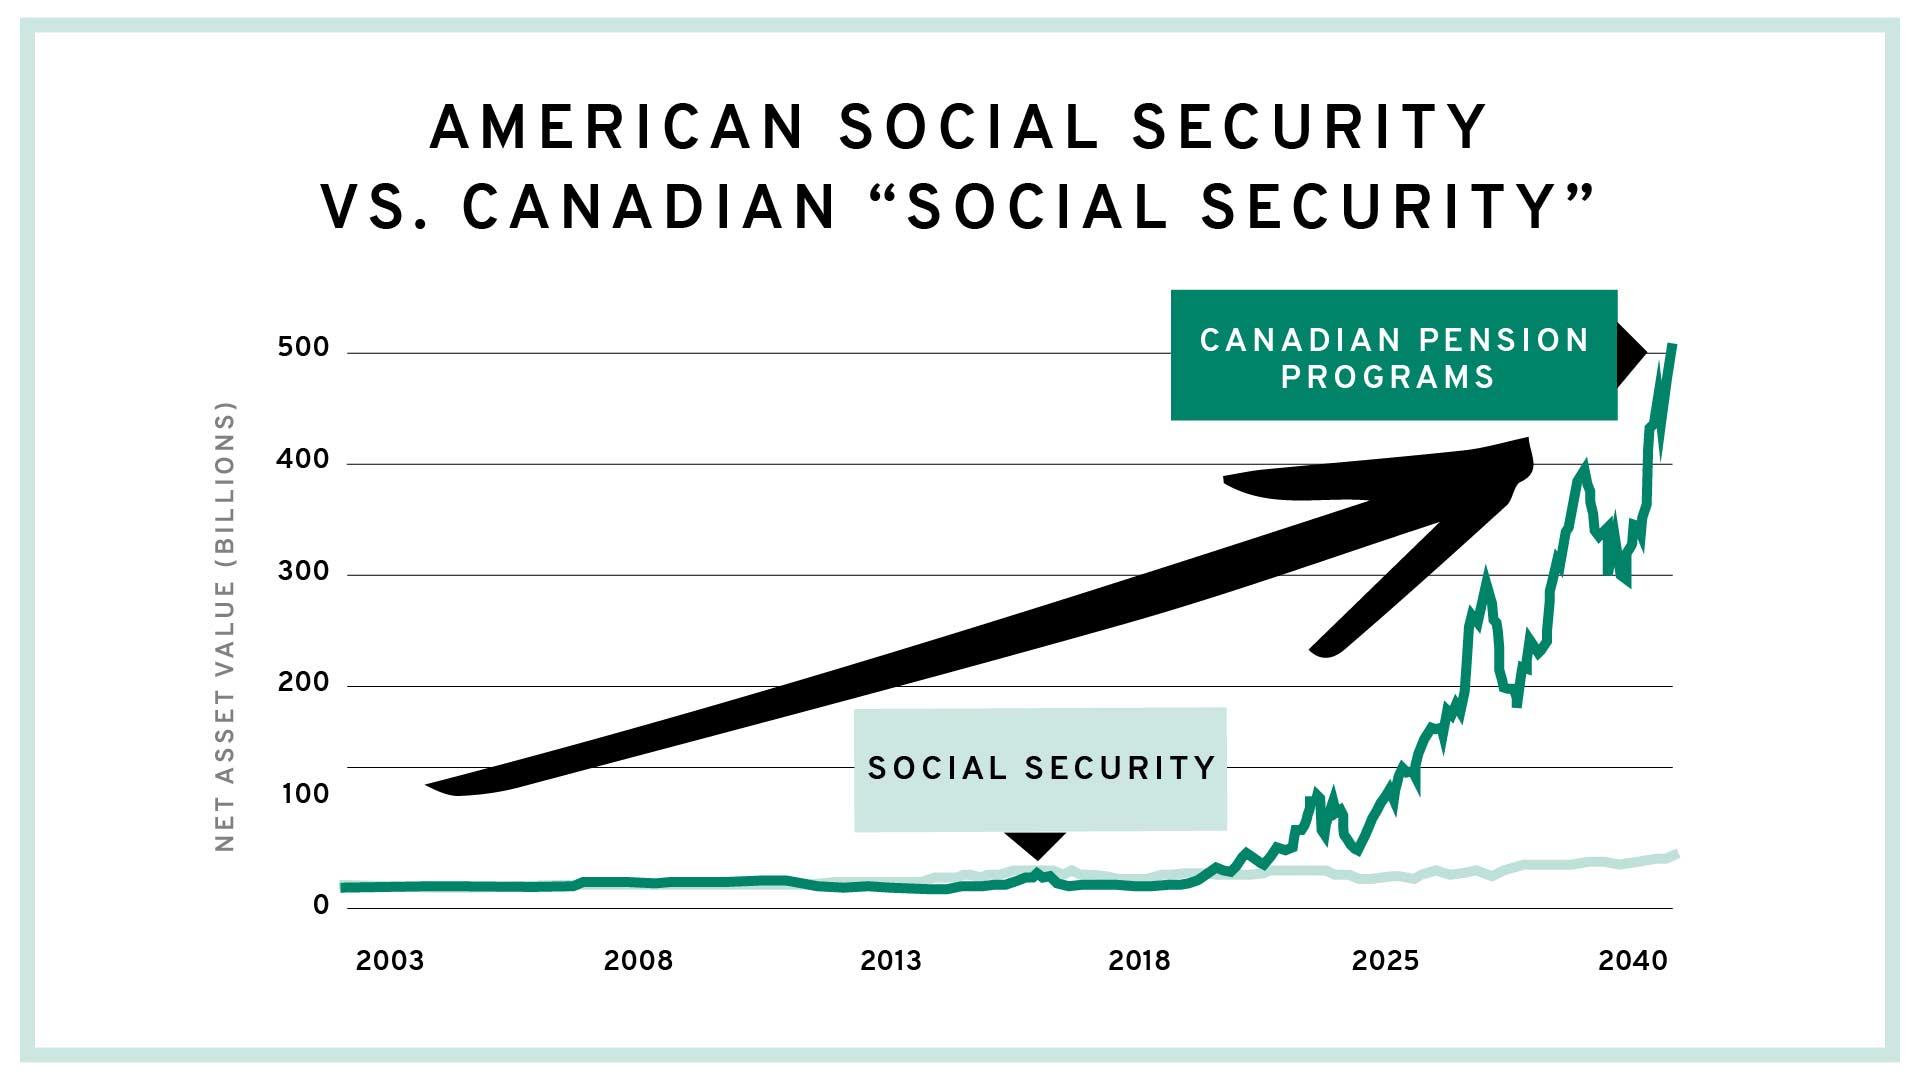 Social Security vs. Canadian Pension Programs Chart